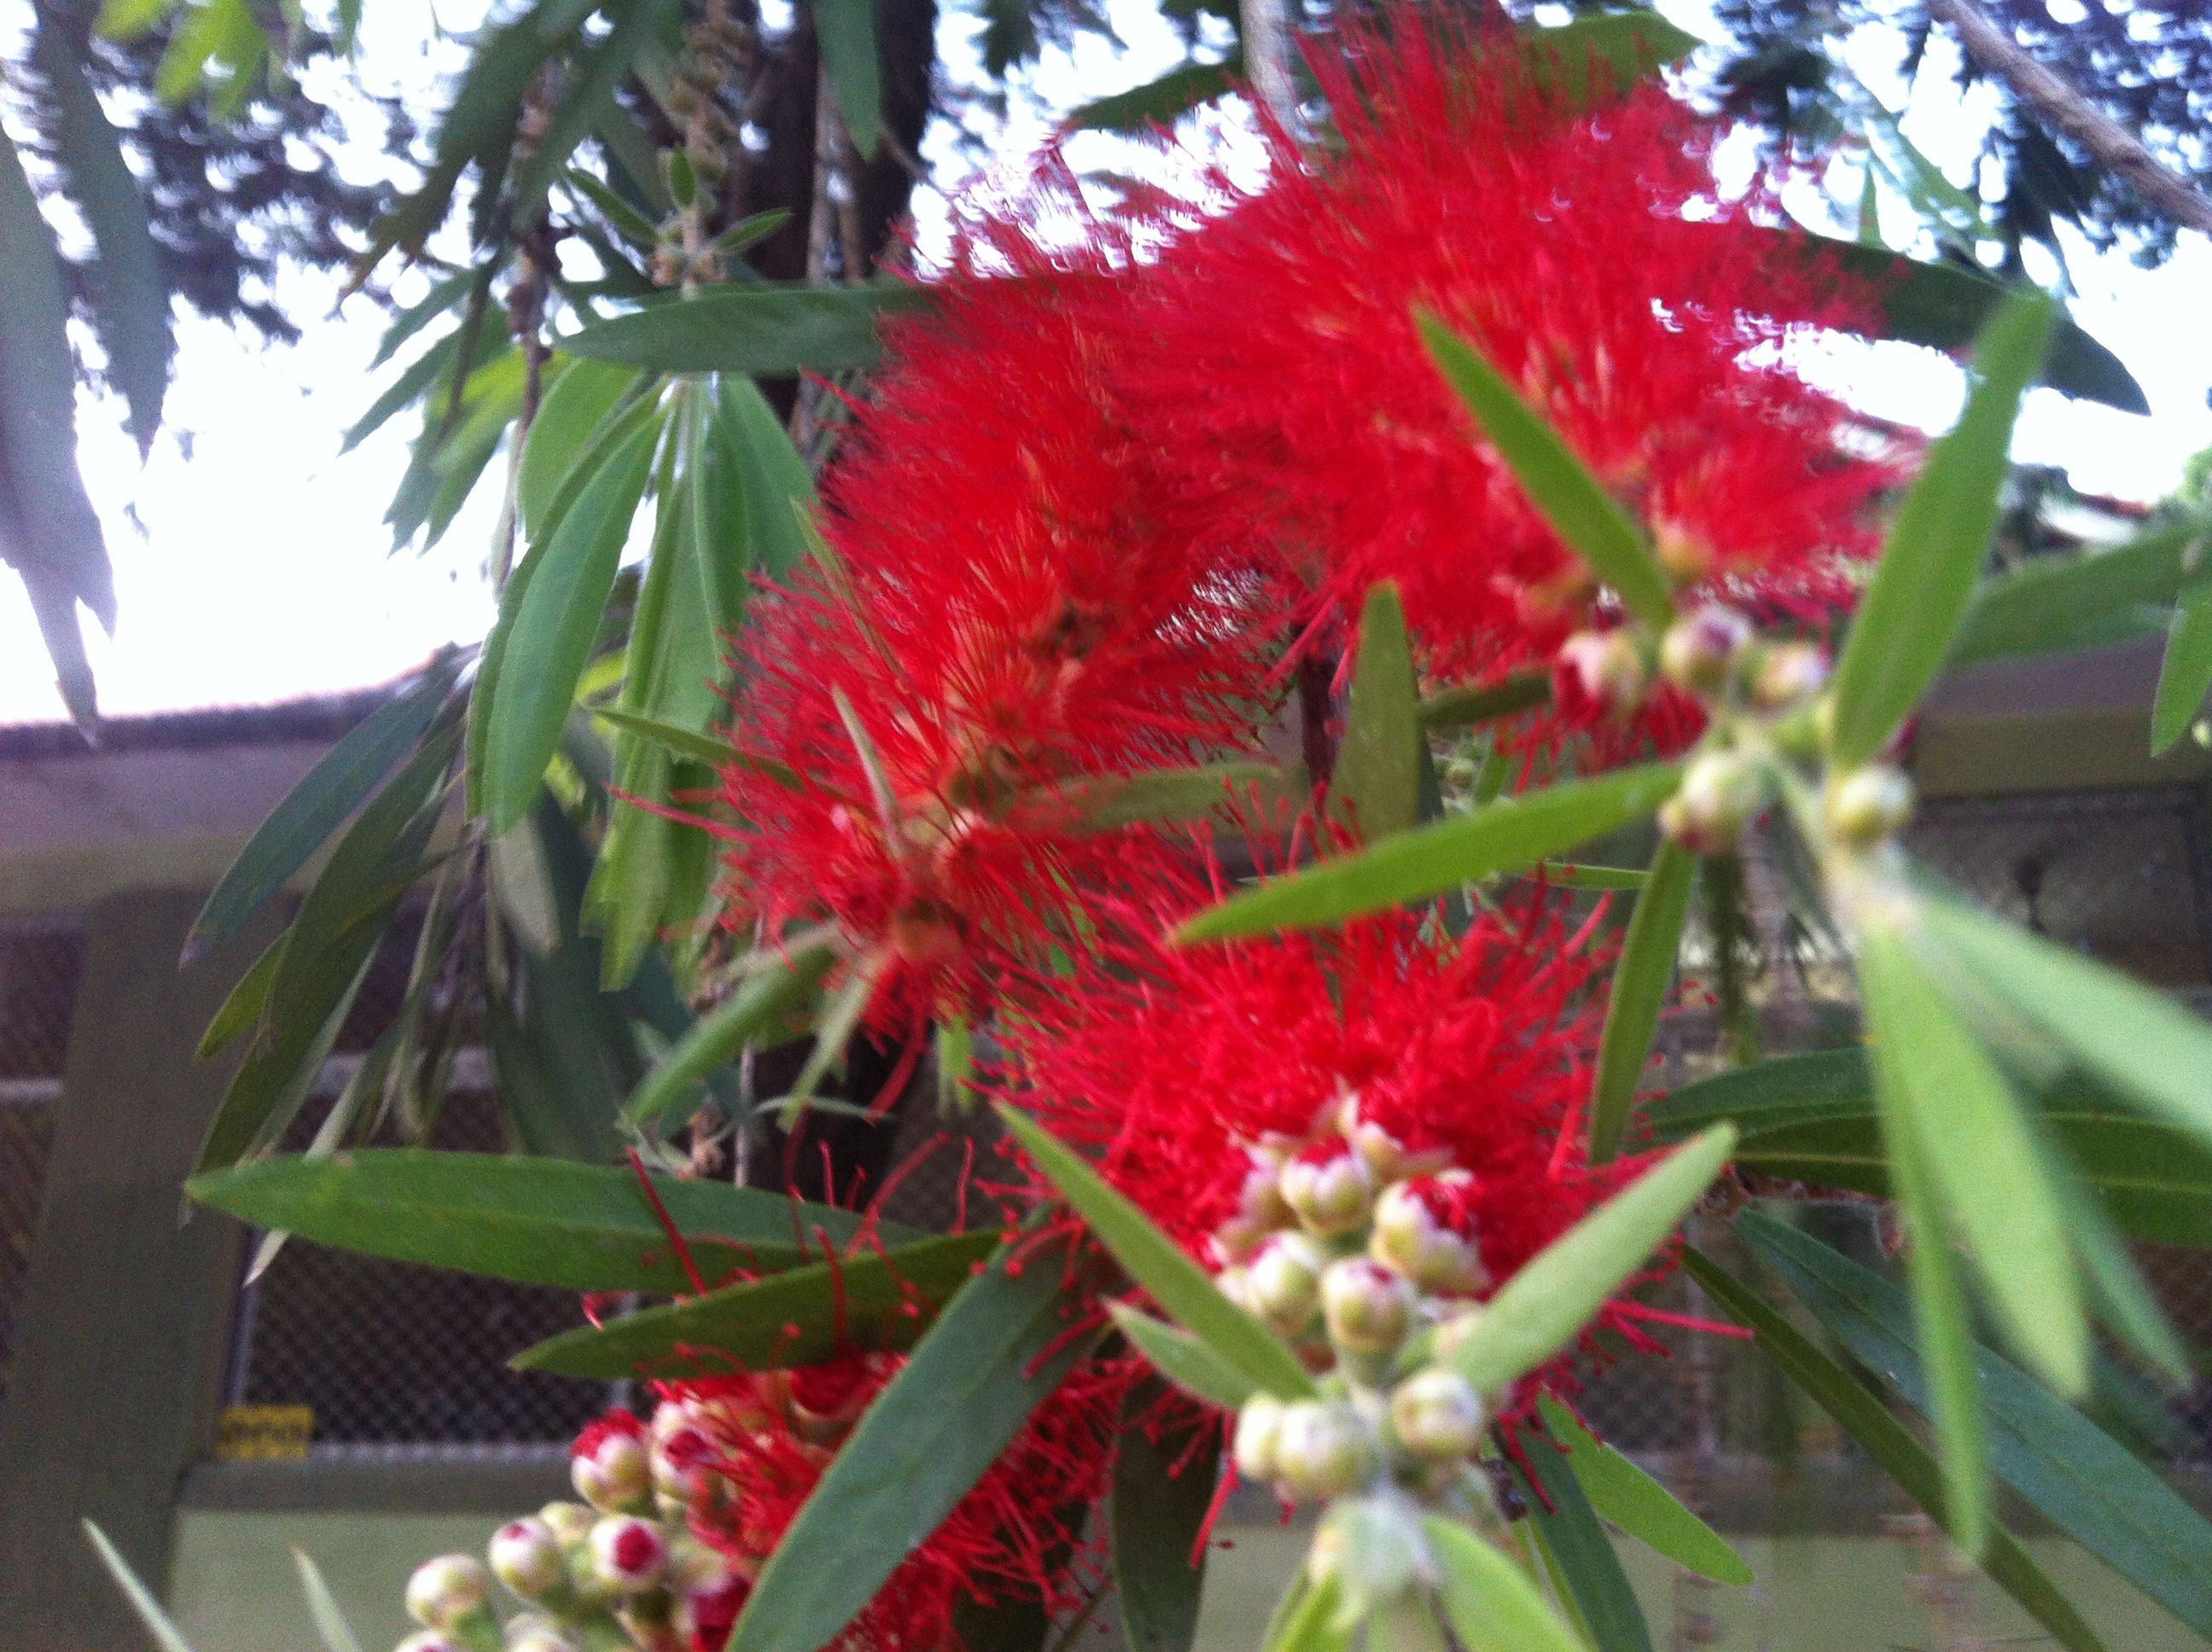 Soft red bristles